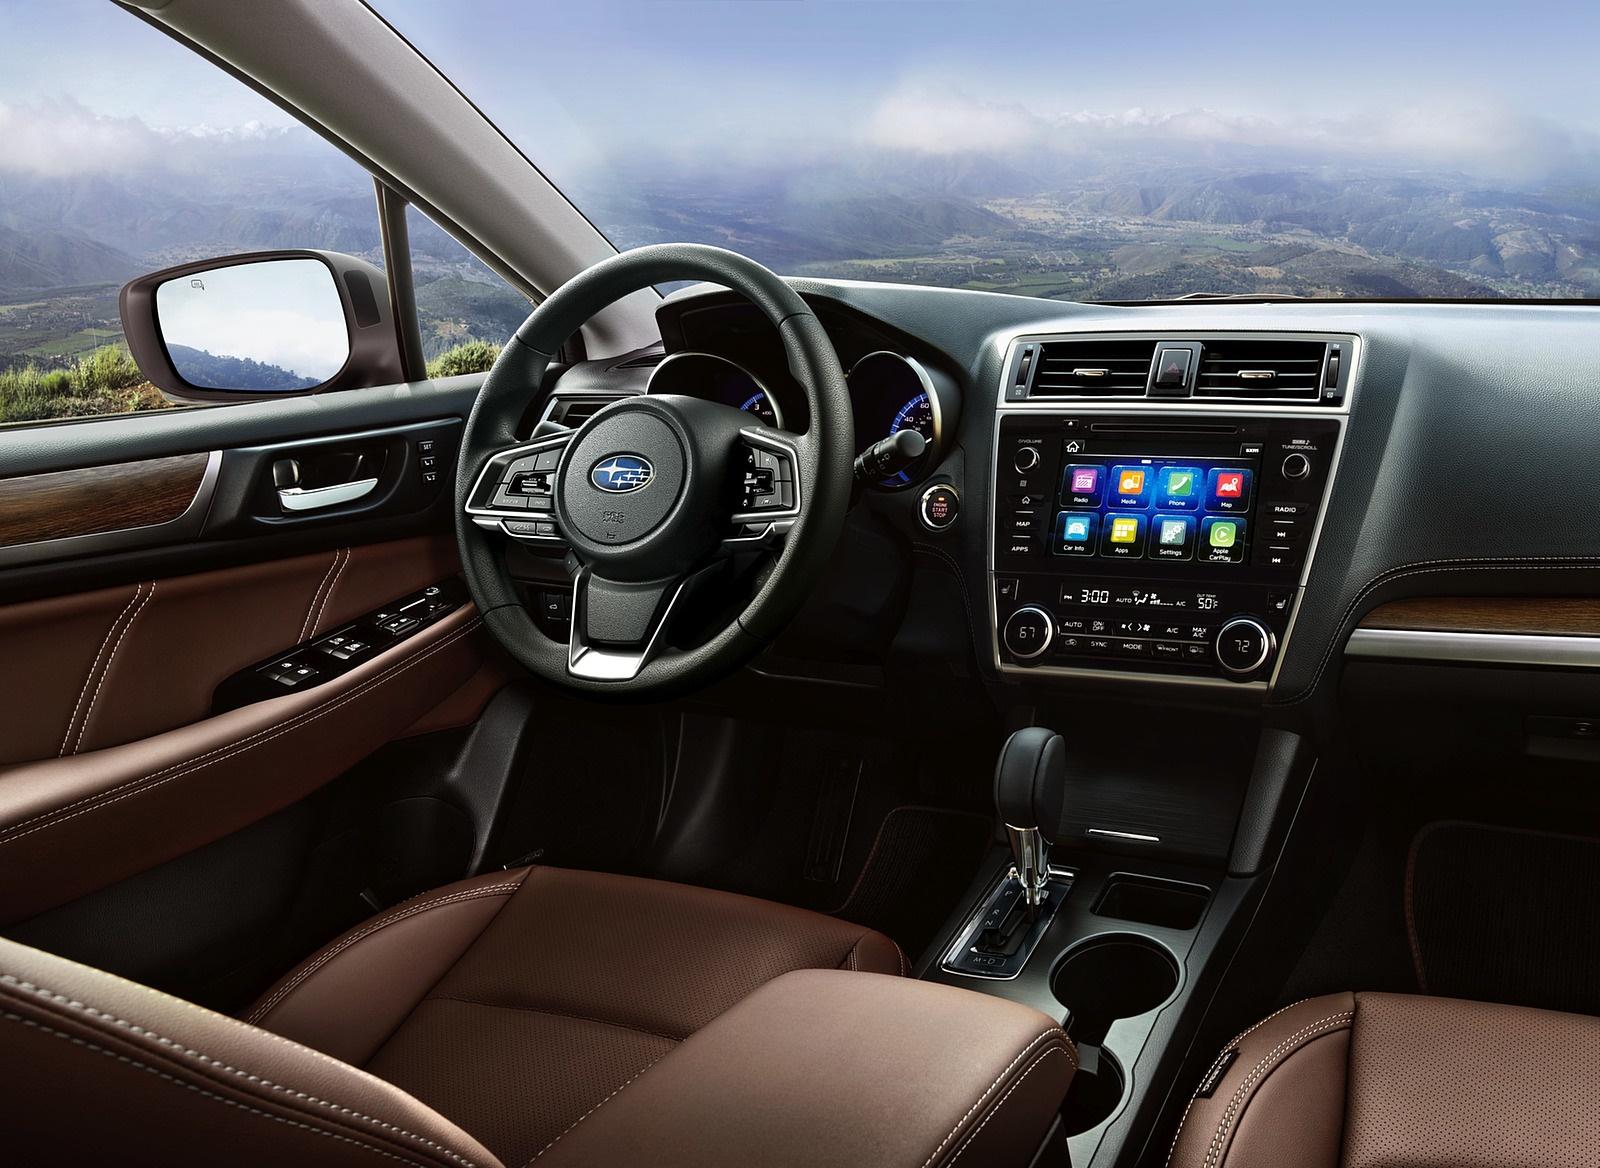 2018 Subaru Outback Interior Cockpit Wallpaper (12)